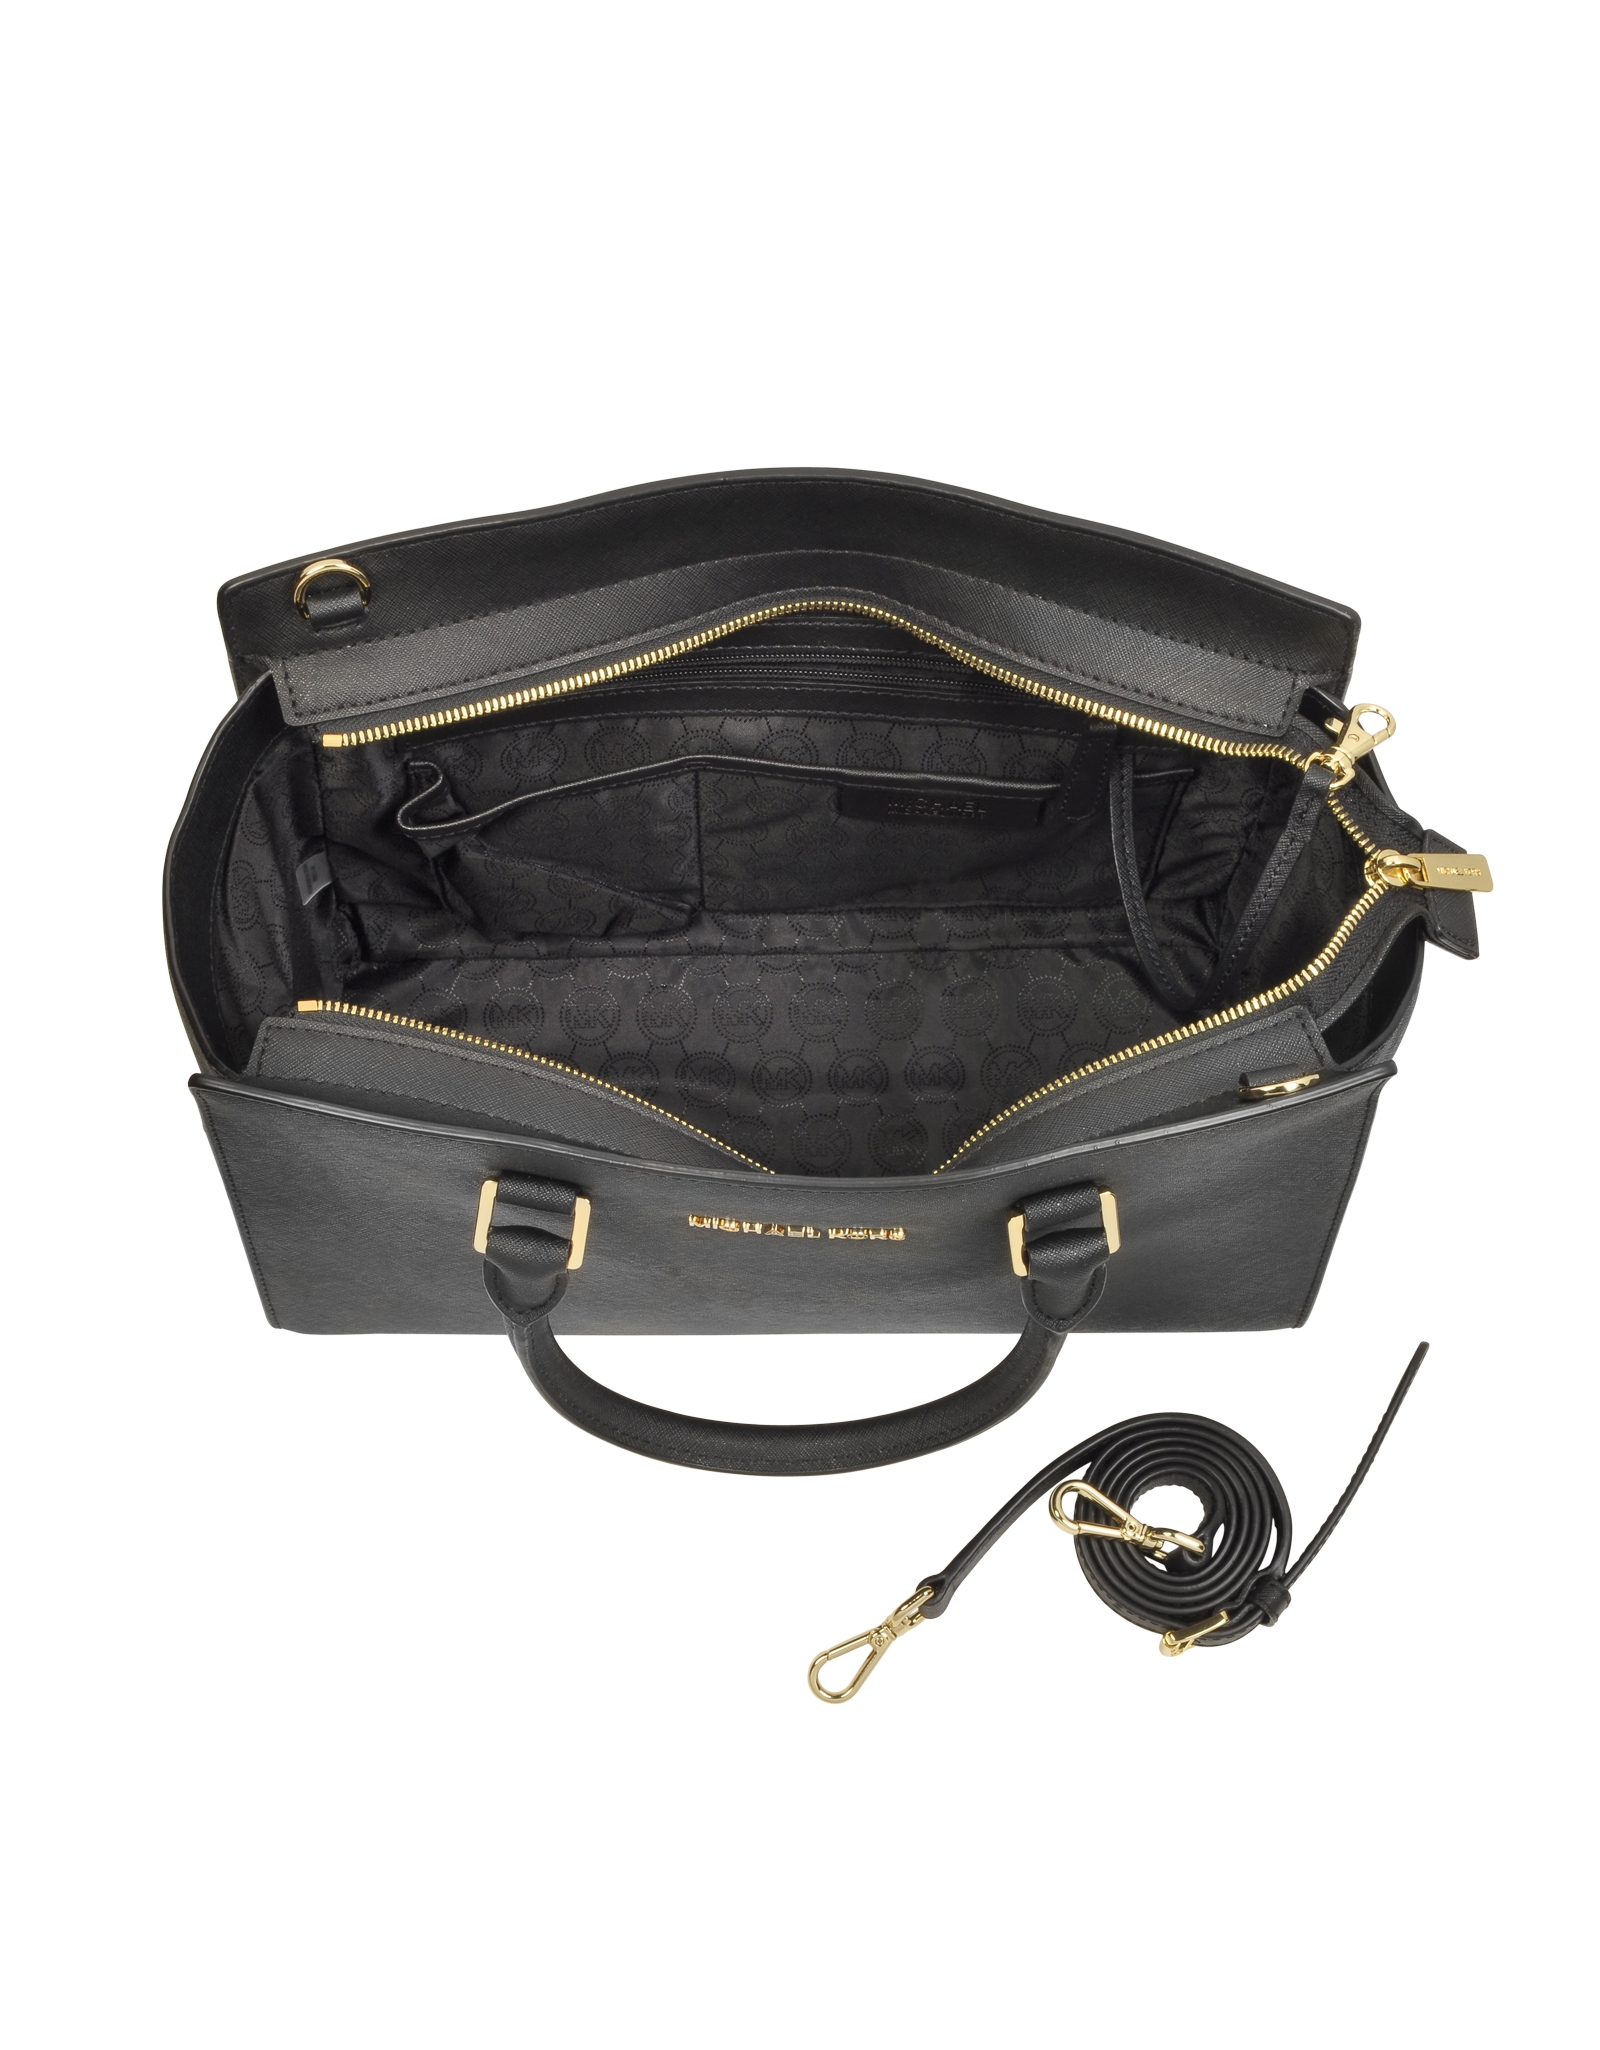 7b31c76925b10b Michael Kors Selma Large Top-zip Saffiano Leather Satchel in Black ...